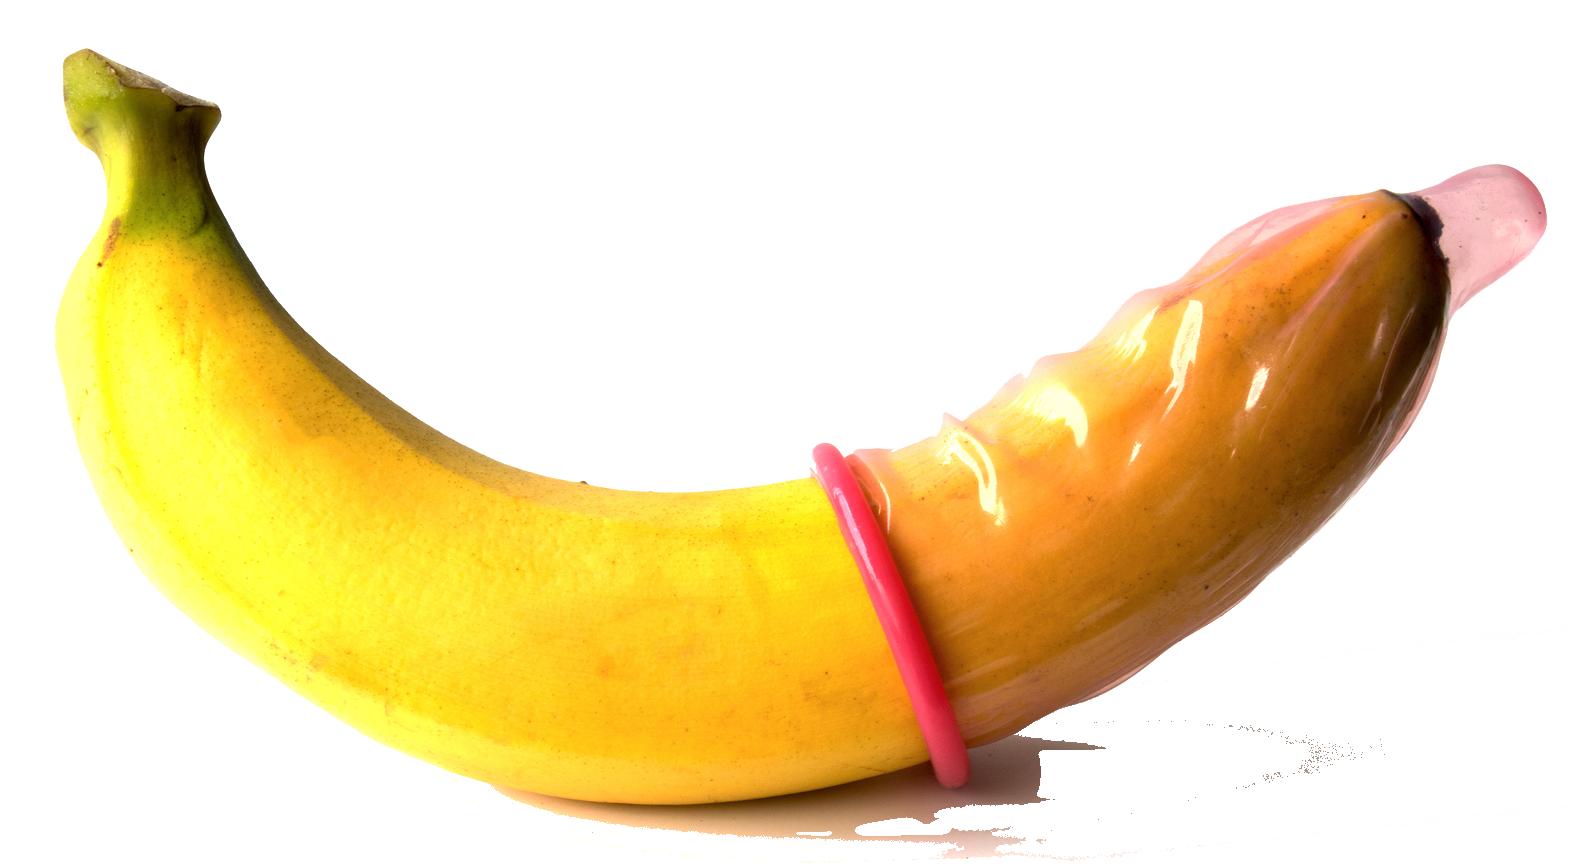 Clipart banana banaba. Honeyandbanana learn more about